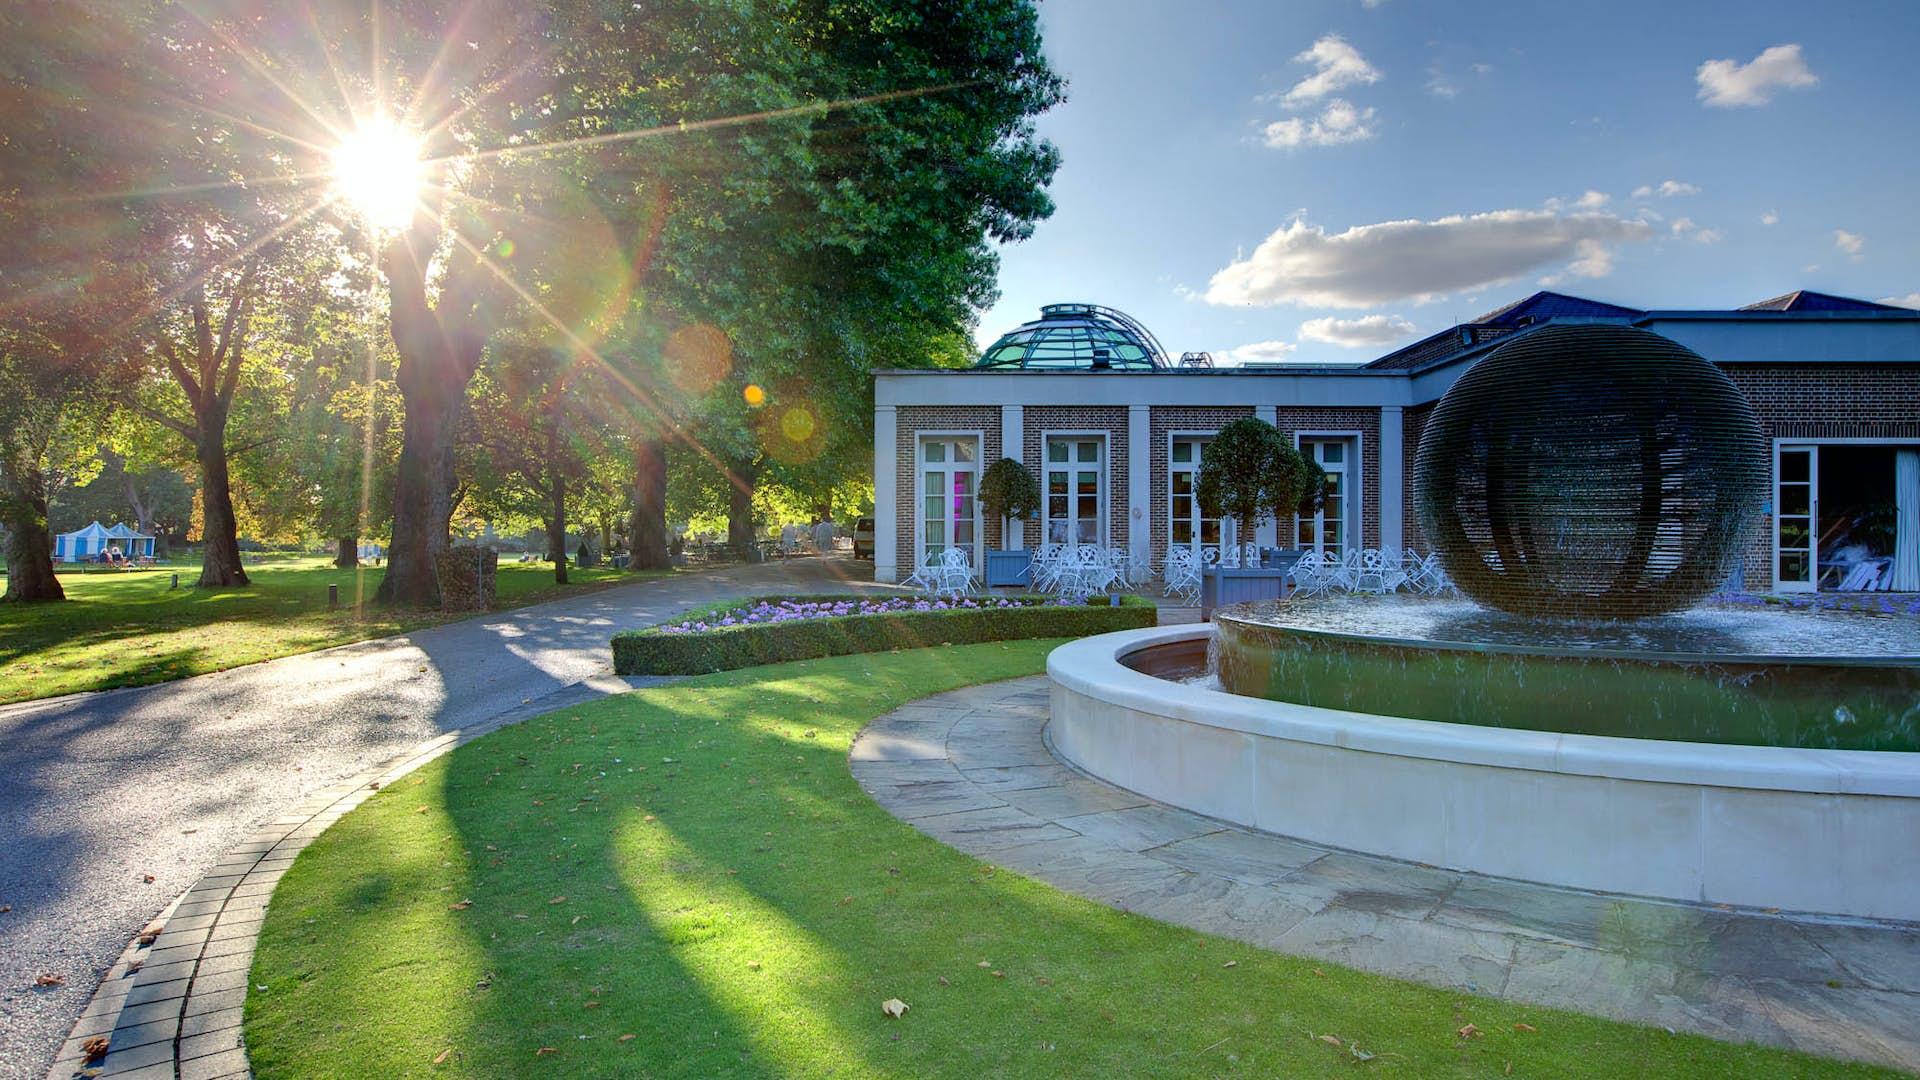 hon4wl4znm0 - The Hurlingham Club Ranelagh Gardens London Sw6 3pr